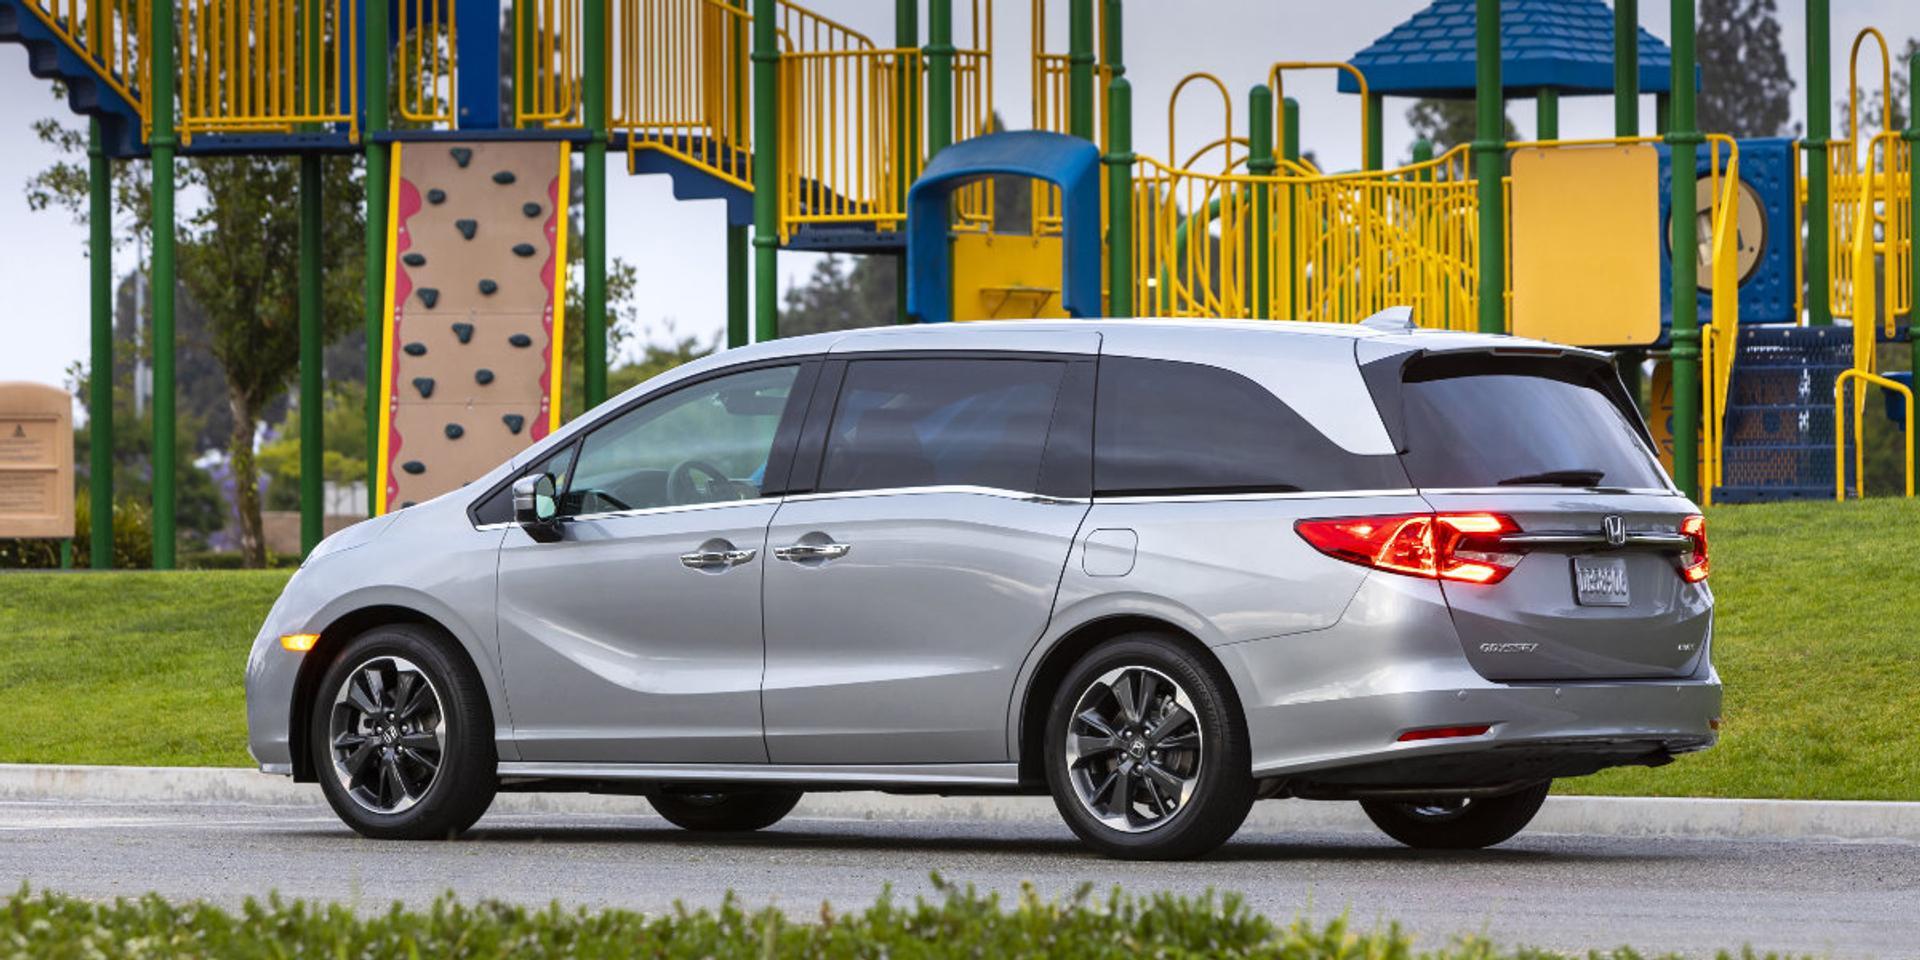 Honda Odyssey rear view